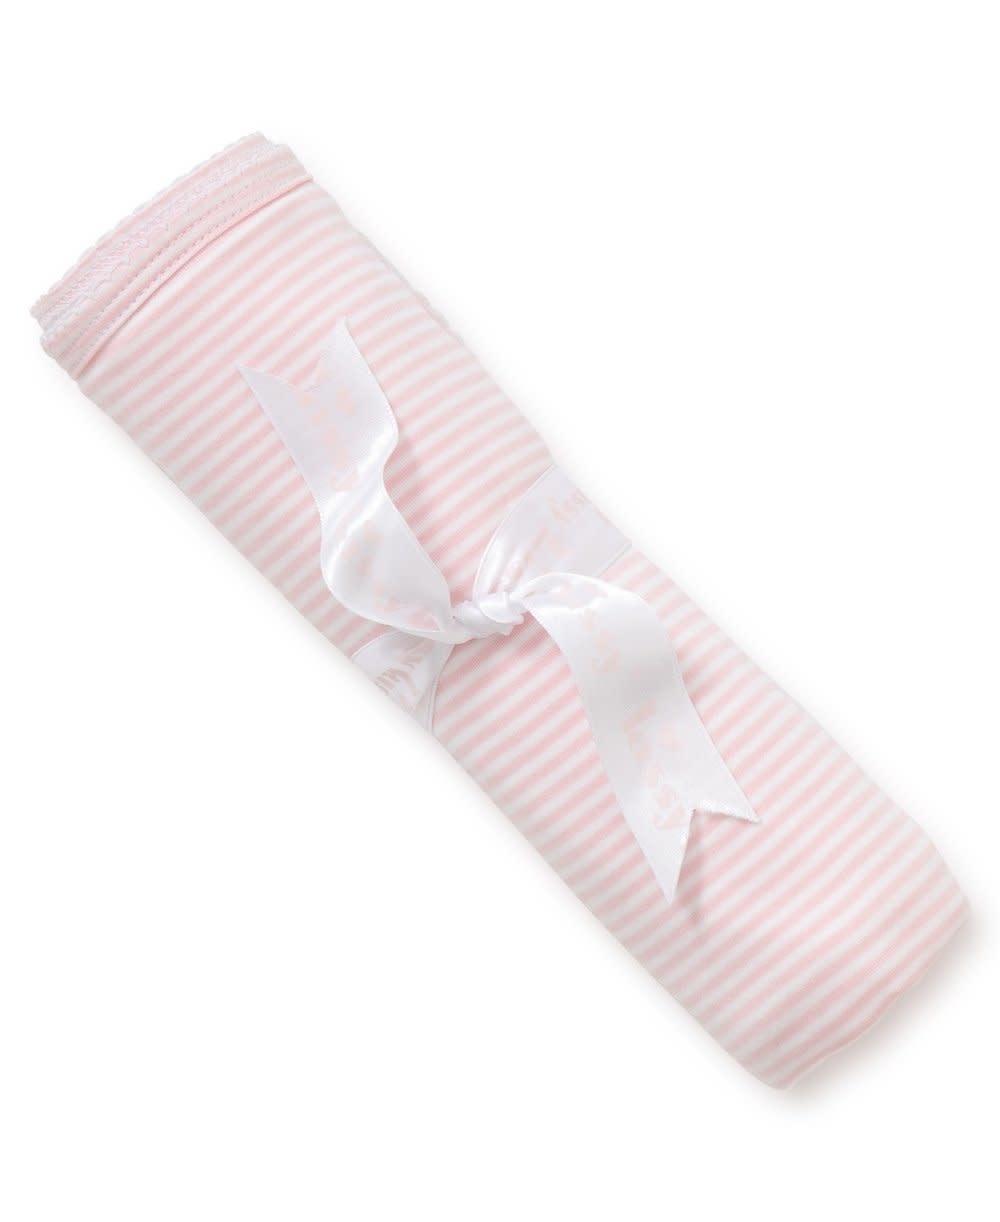 Kissy Kissy Simple stripes blanket Pink